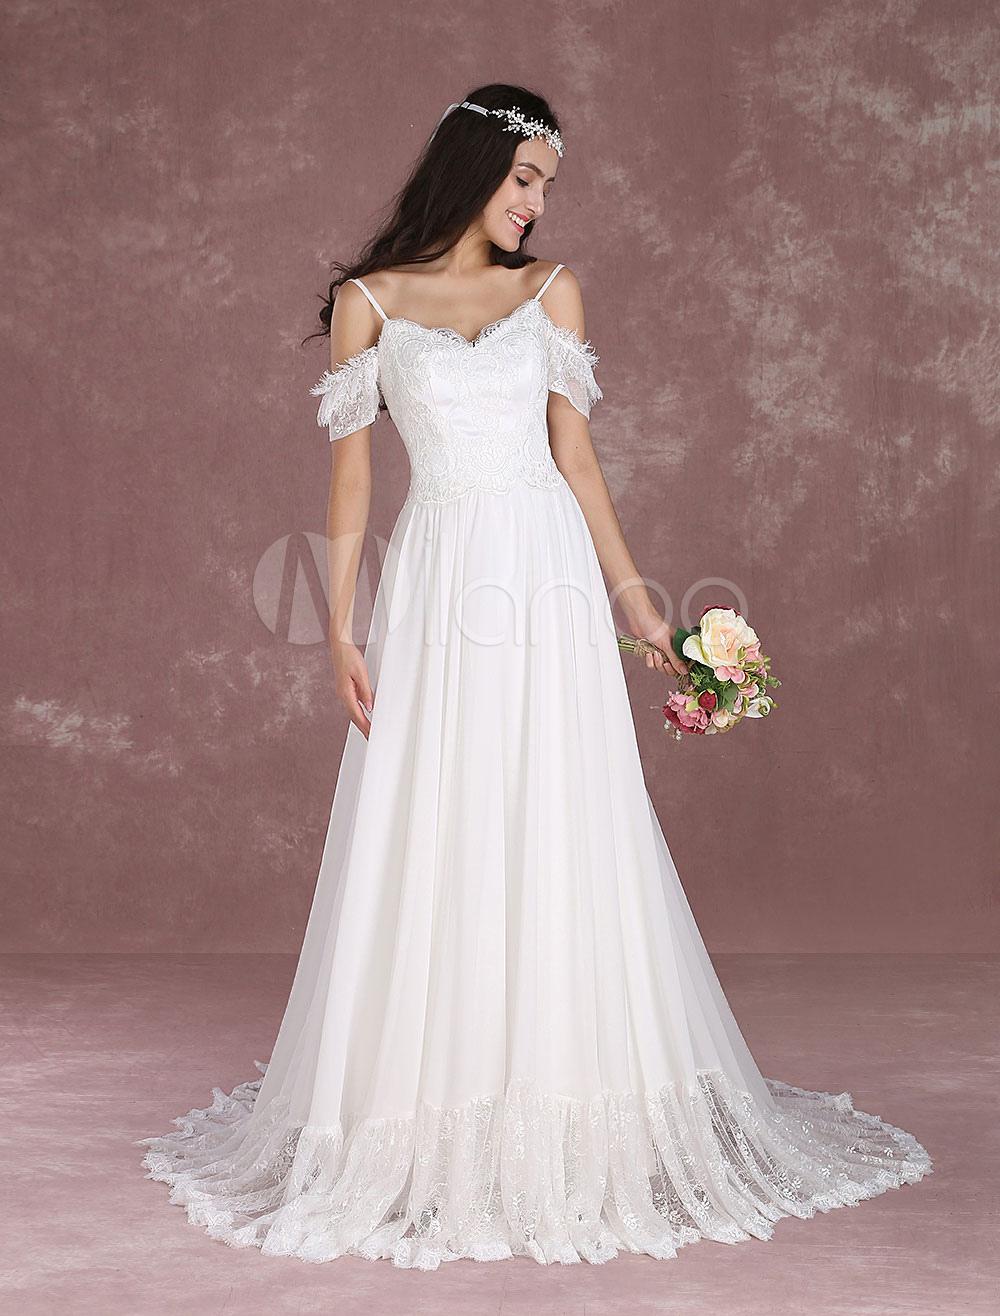 Summer Wedding Dresses 2018 Chiffon Off The Shoulder Beach Bridal Dress Boho Backless Spaghetti Straps Train Bridal Gown Milanoo